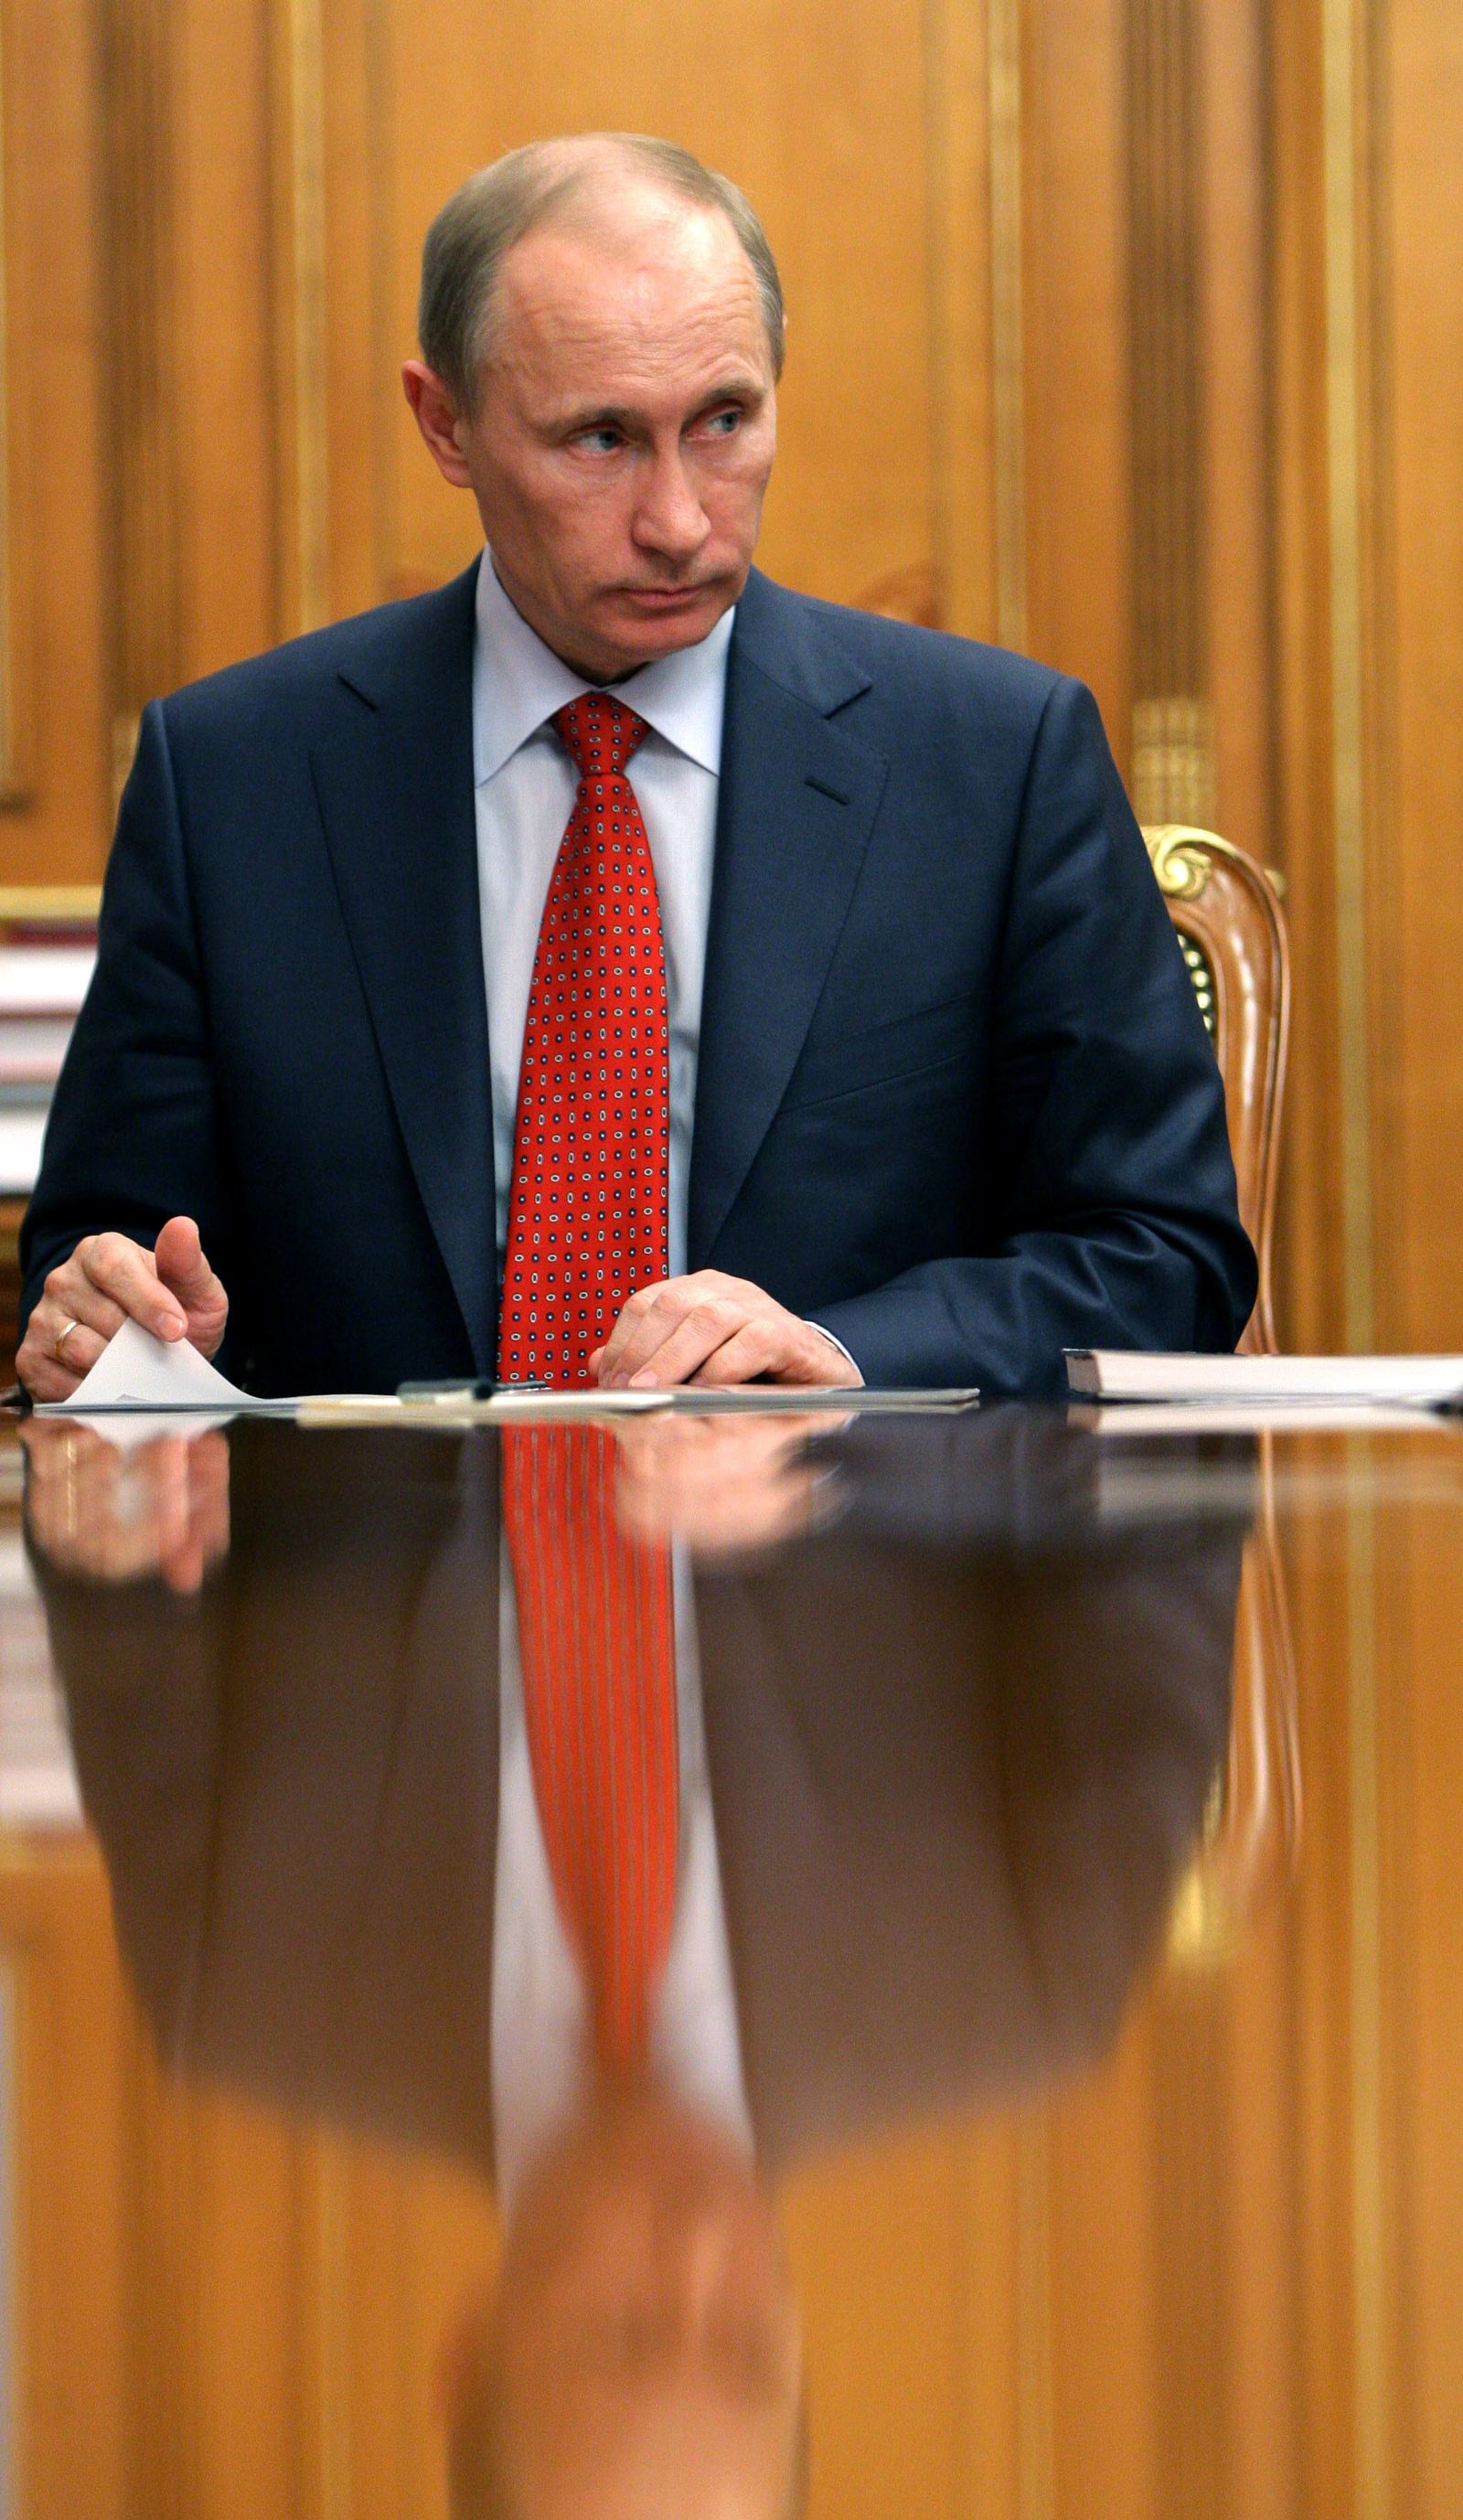 Putin / Medwedew